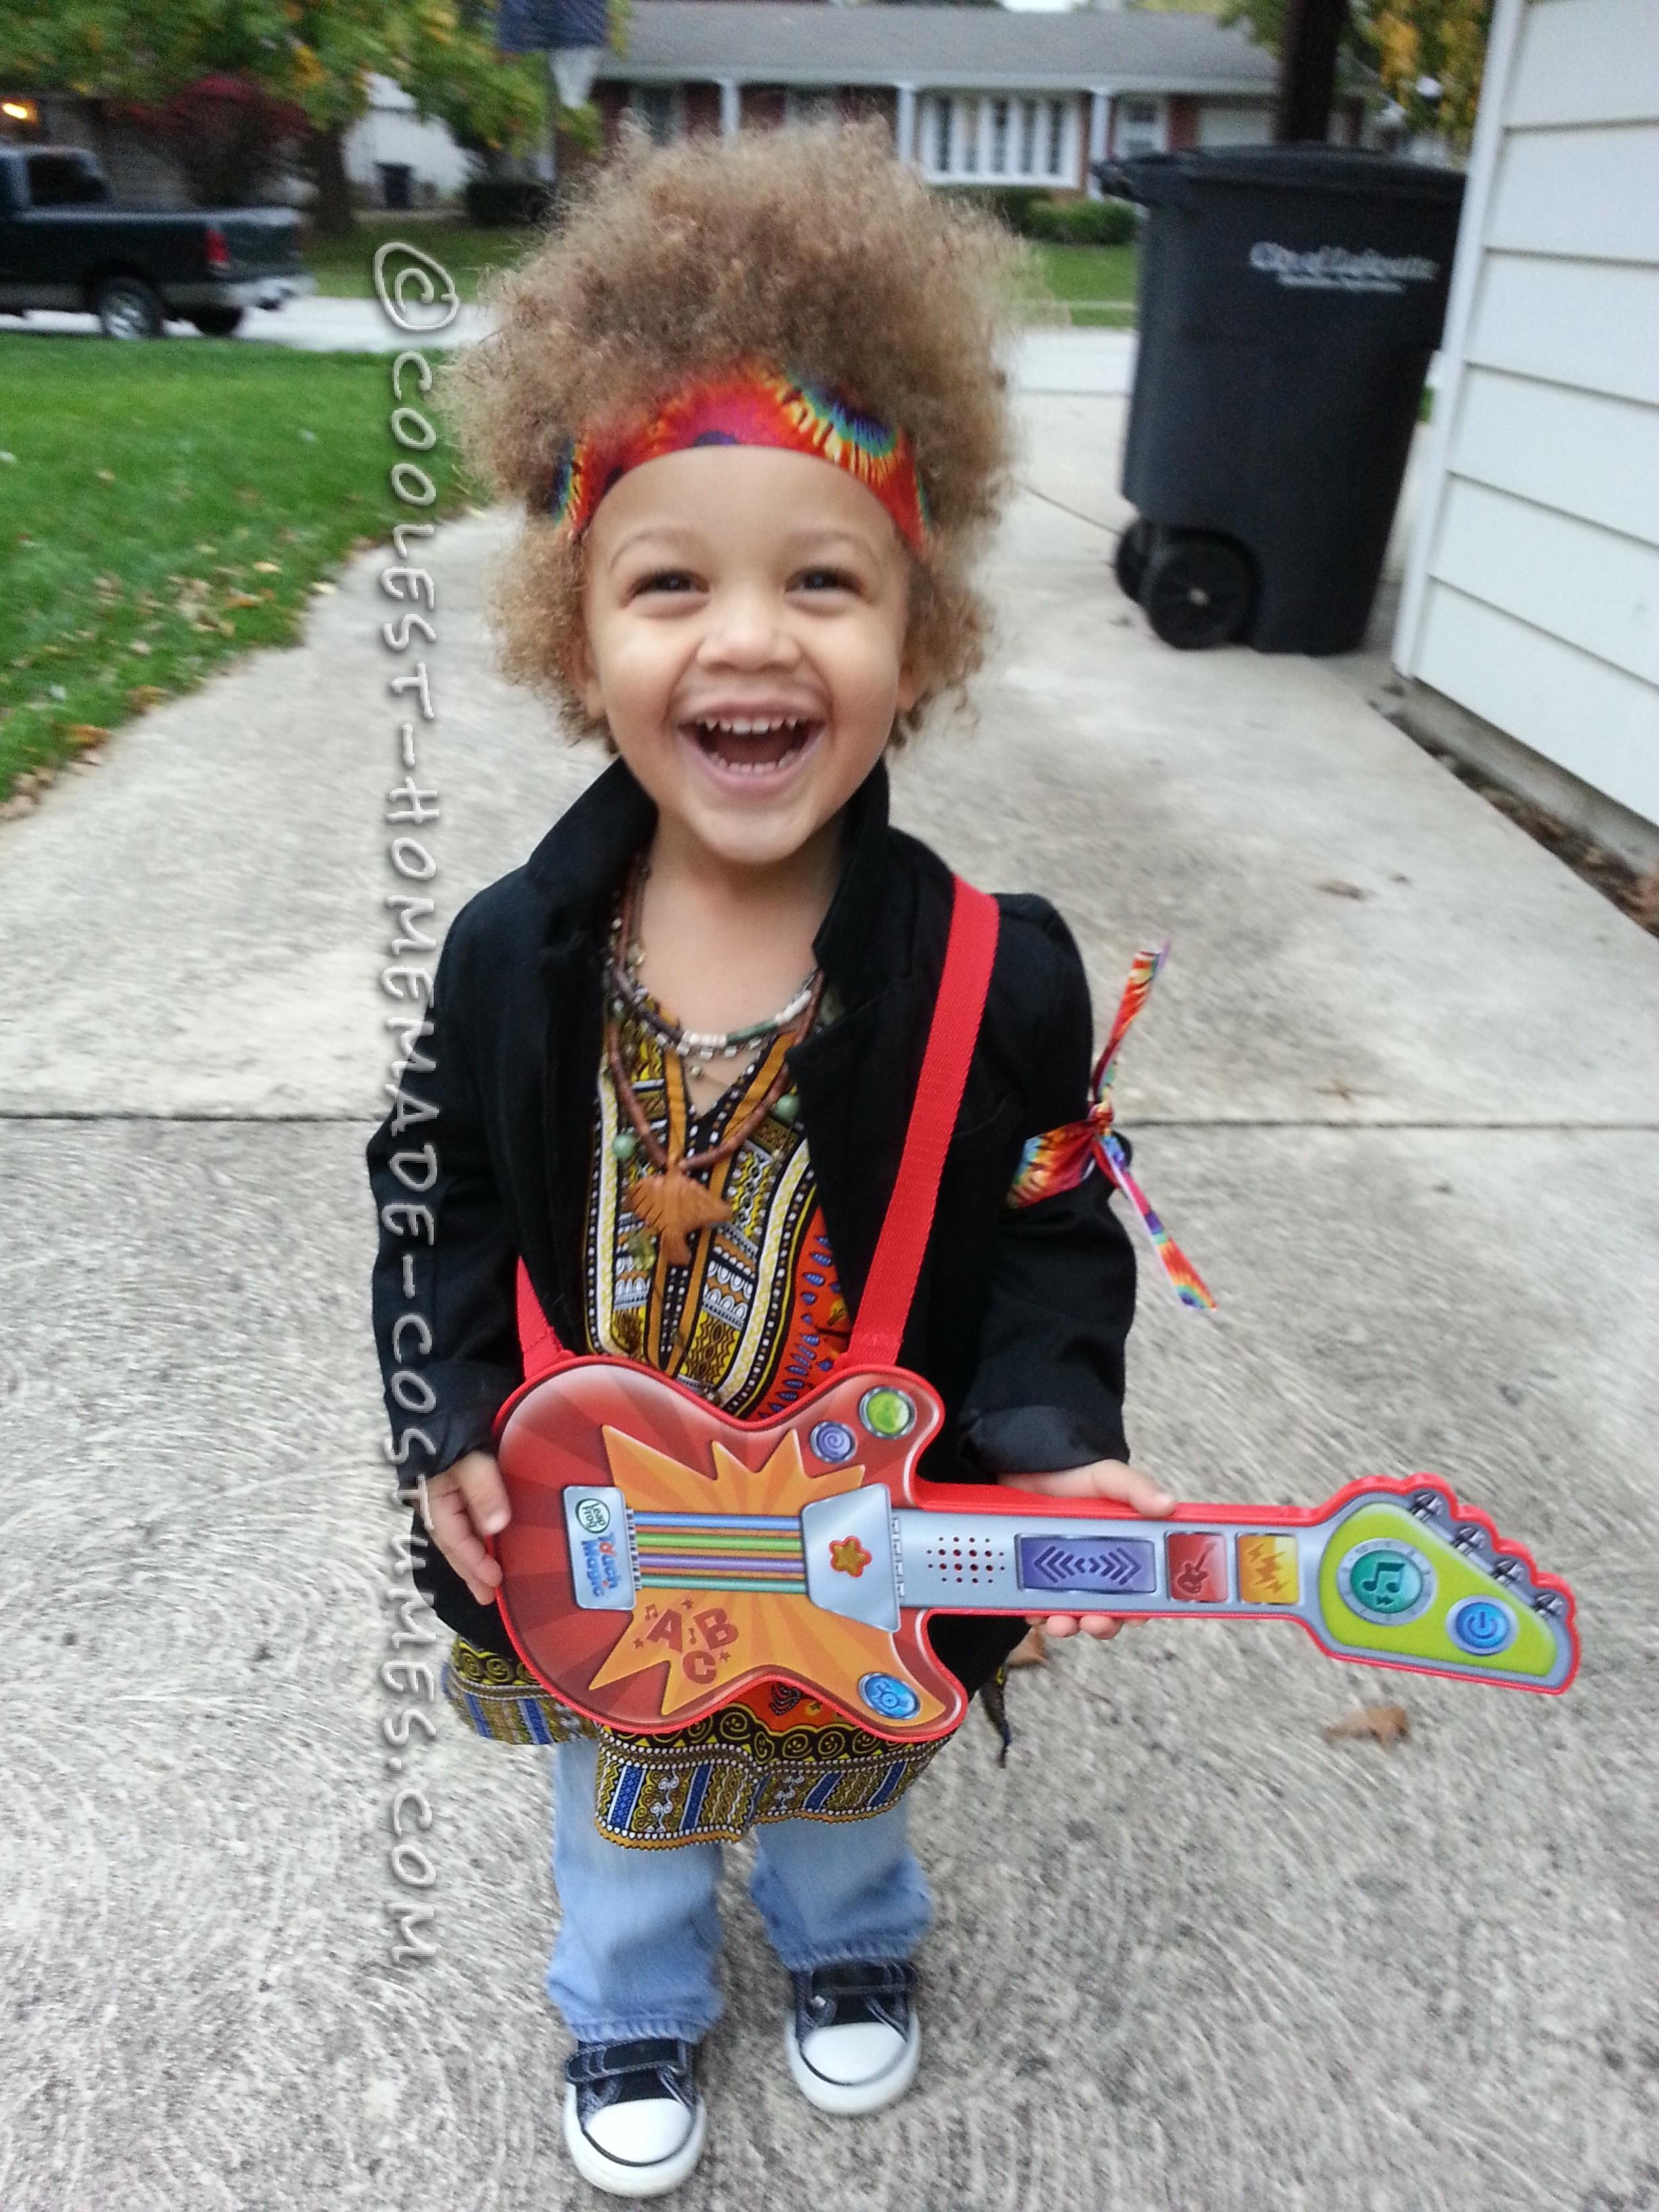 Homemade Jimi Hendrix Costume for a Boy